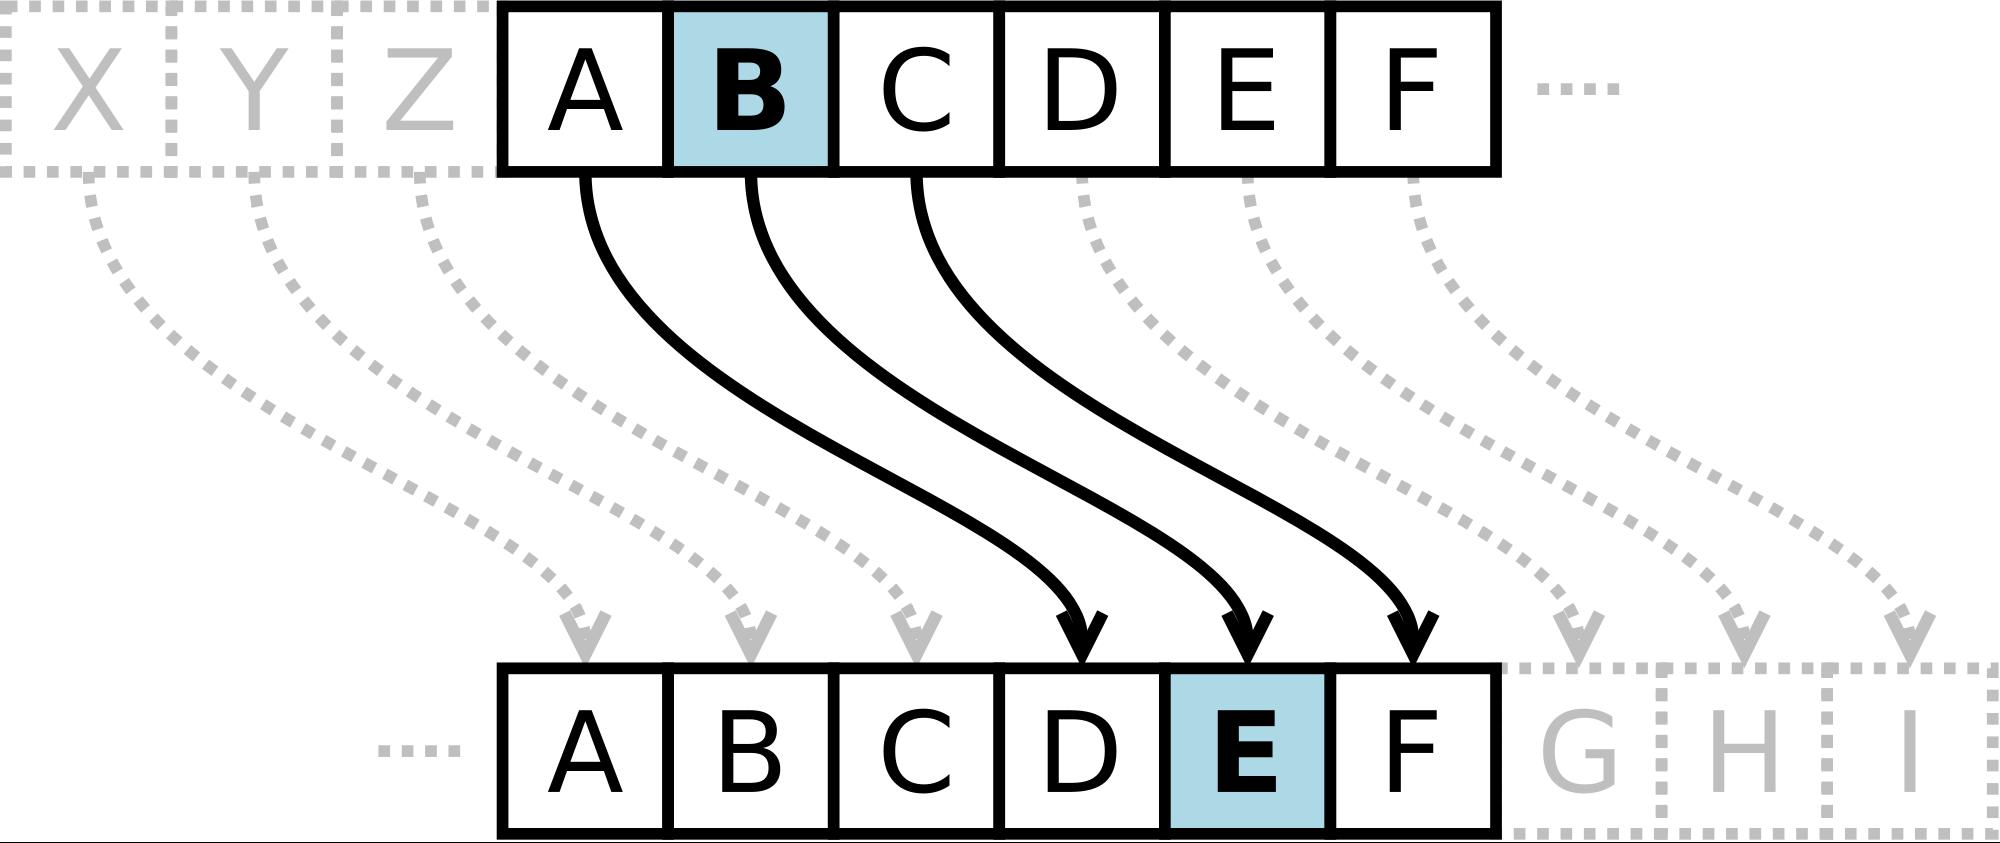 Lab 4-2: Caesar Cipher - Encrypting and Decrypting — CSP Python